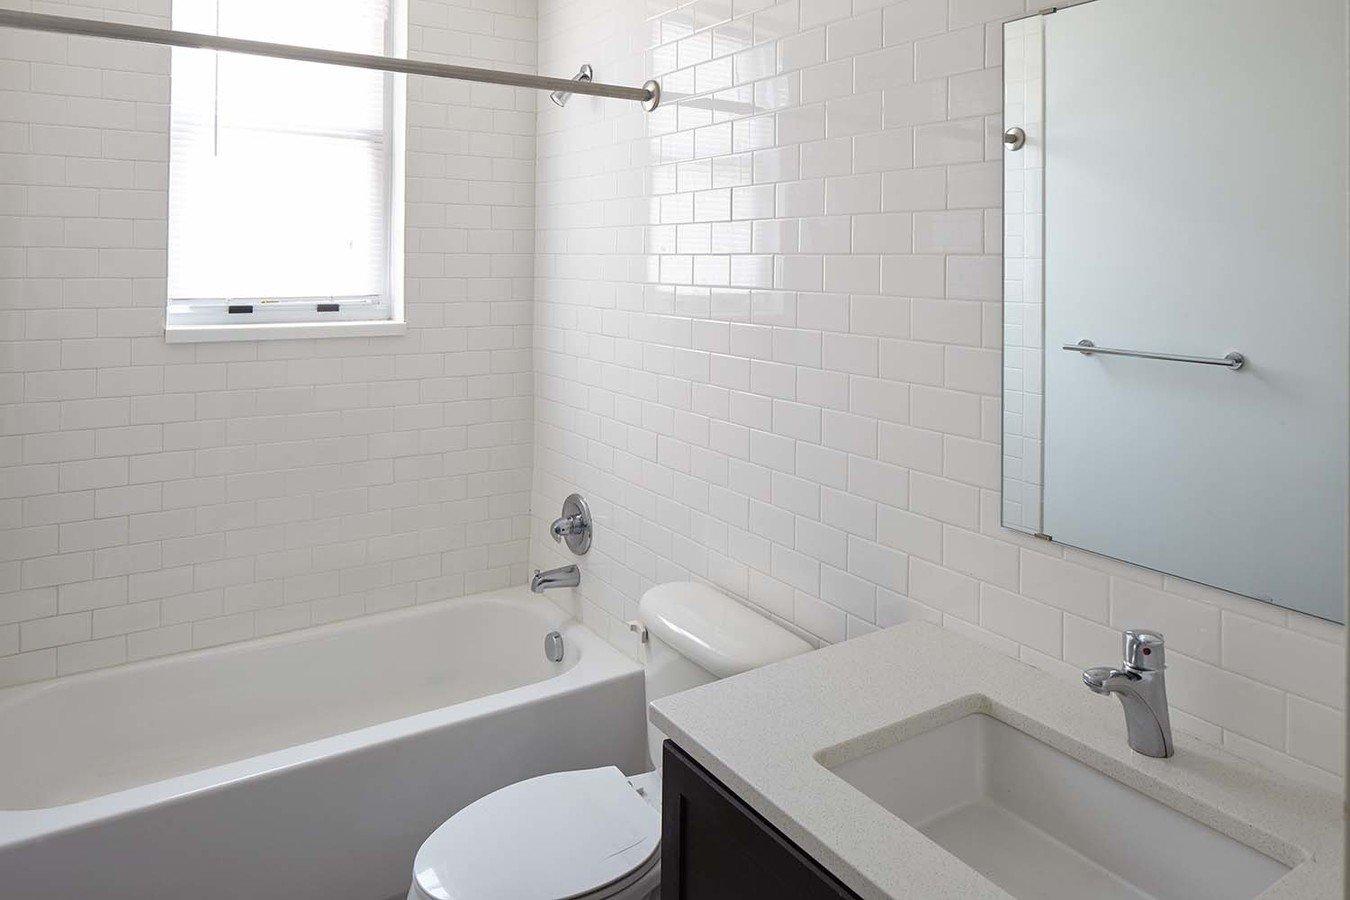 Studio 1 Bathroom Apartment for rent at Bellerive in Kansas City, MO